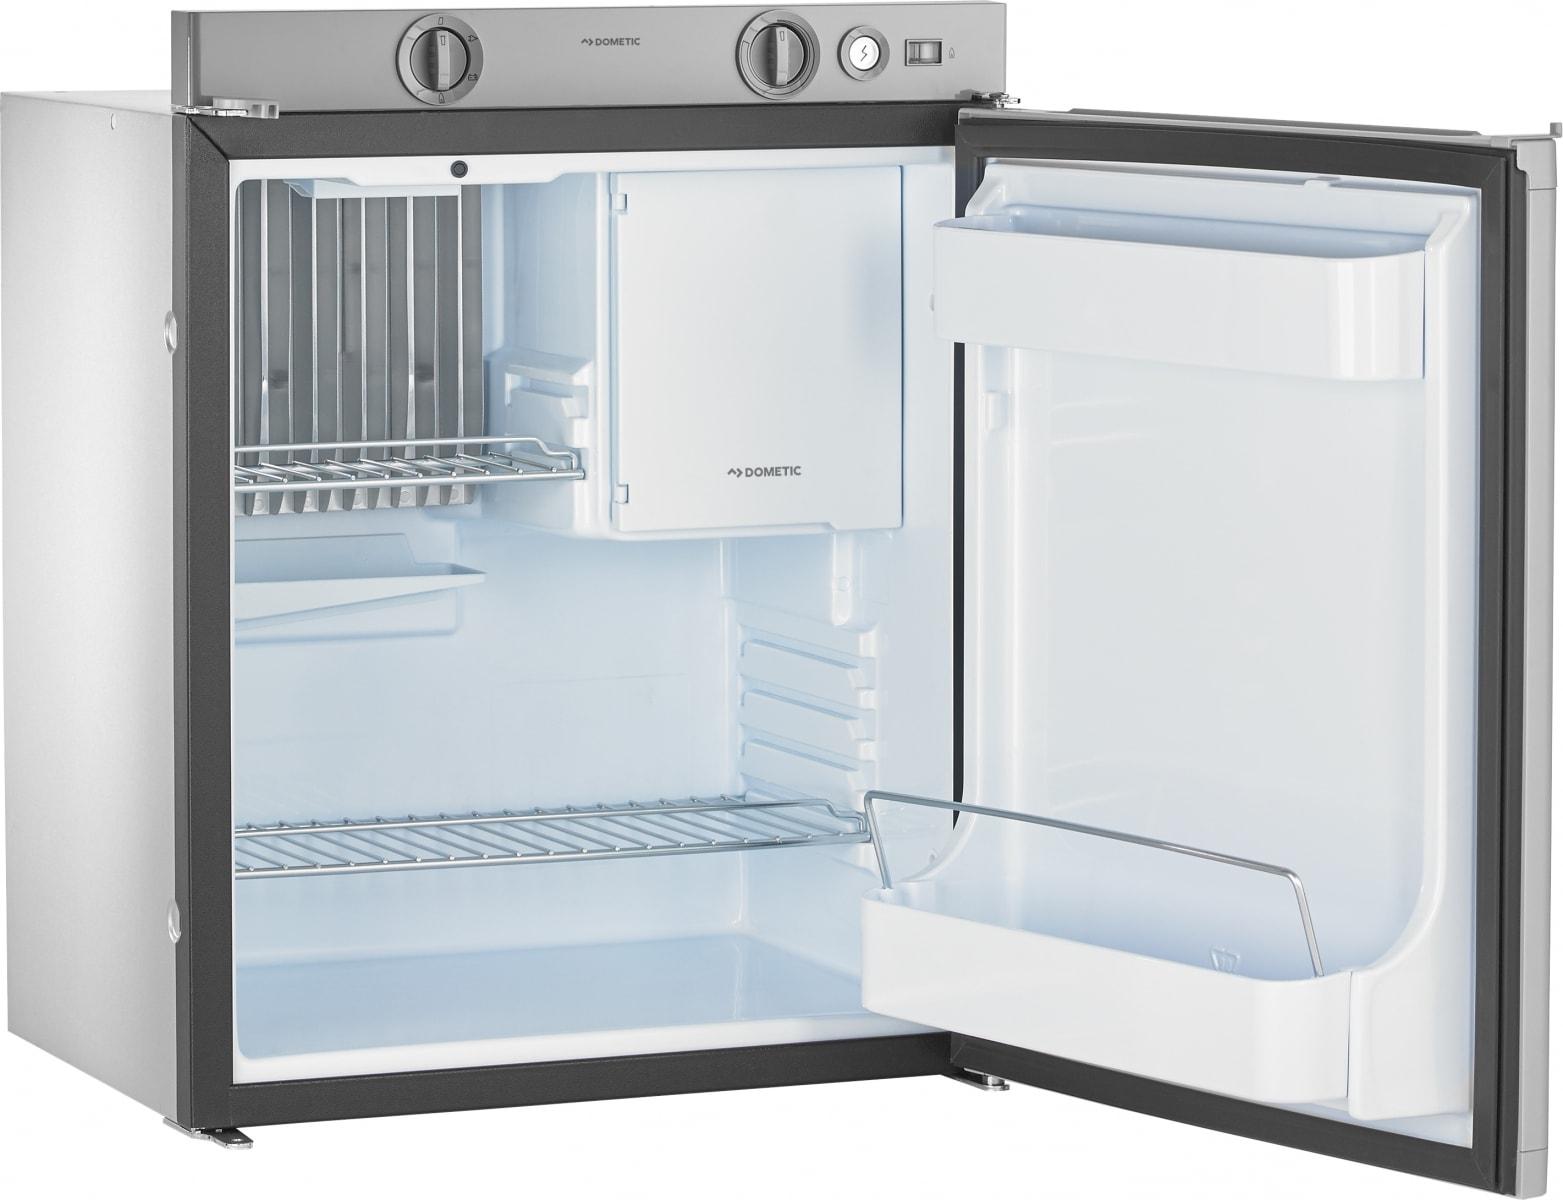 Kleiner Reisekühlschrank : Dometic kühlschrank rm l mbar reisekühlschrank wohnmobil